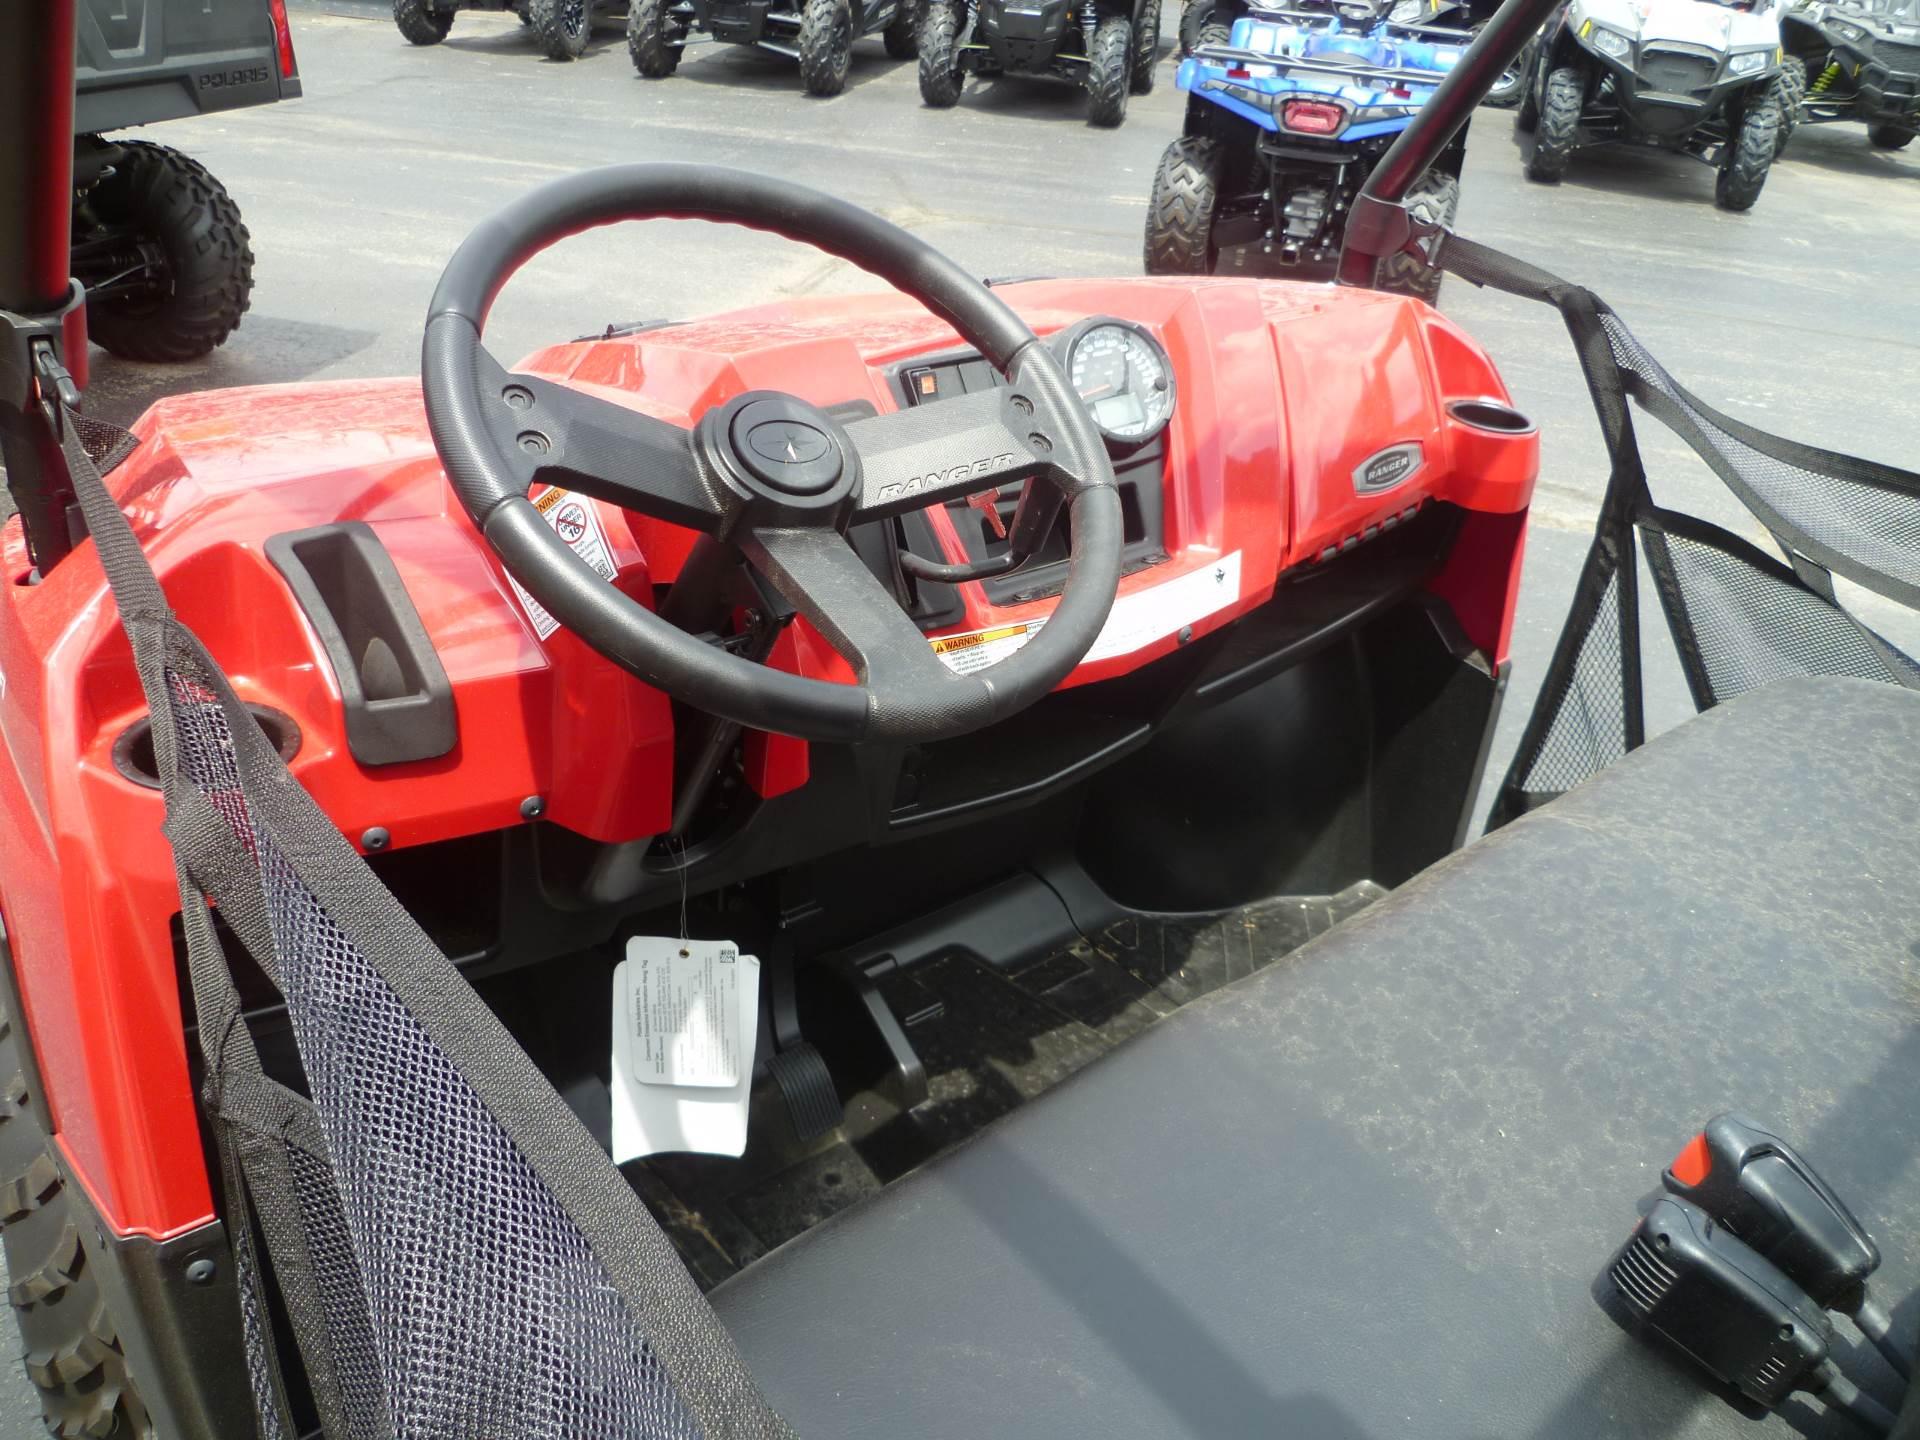 2016 Polaris Ranger570 Full Size 12